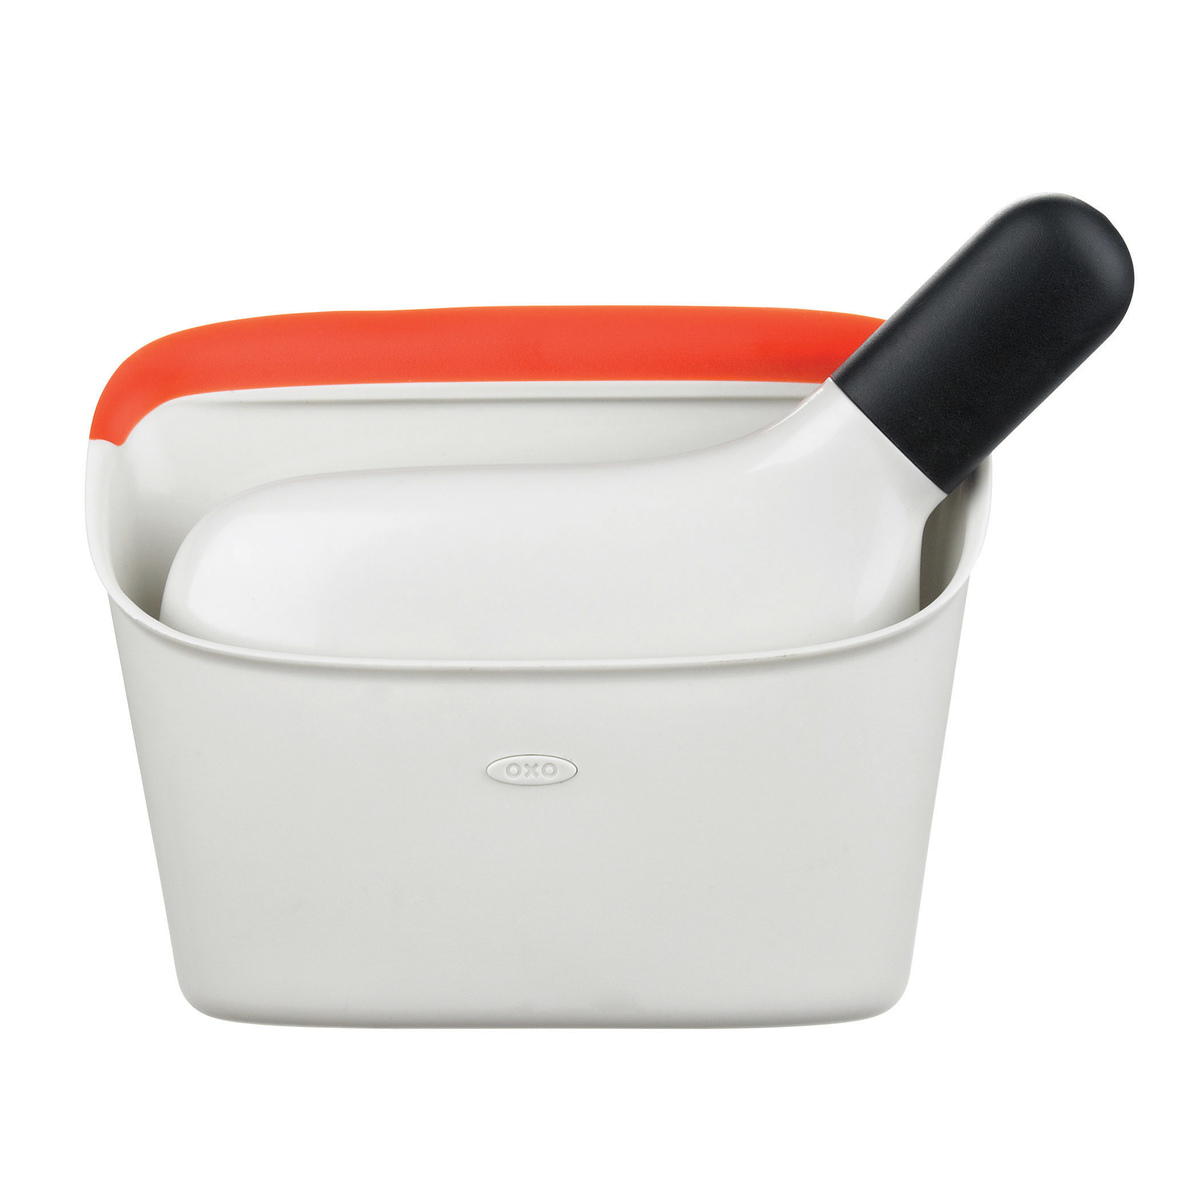 Онлайн каталог PROMENU: Набор щетка с контейнером OXO CLEANING, 4х19х14 см, белый, 2 предмета                                   1334280